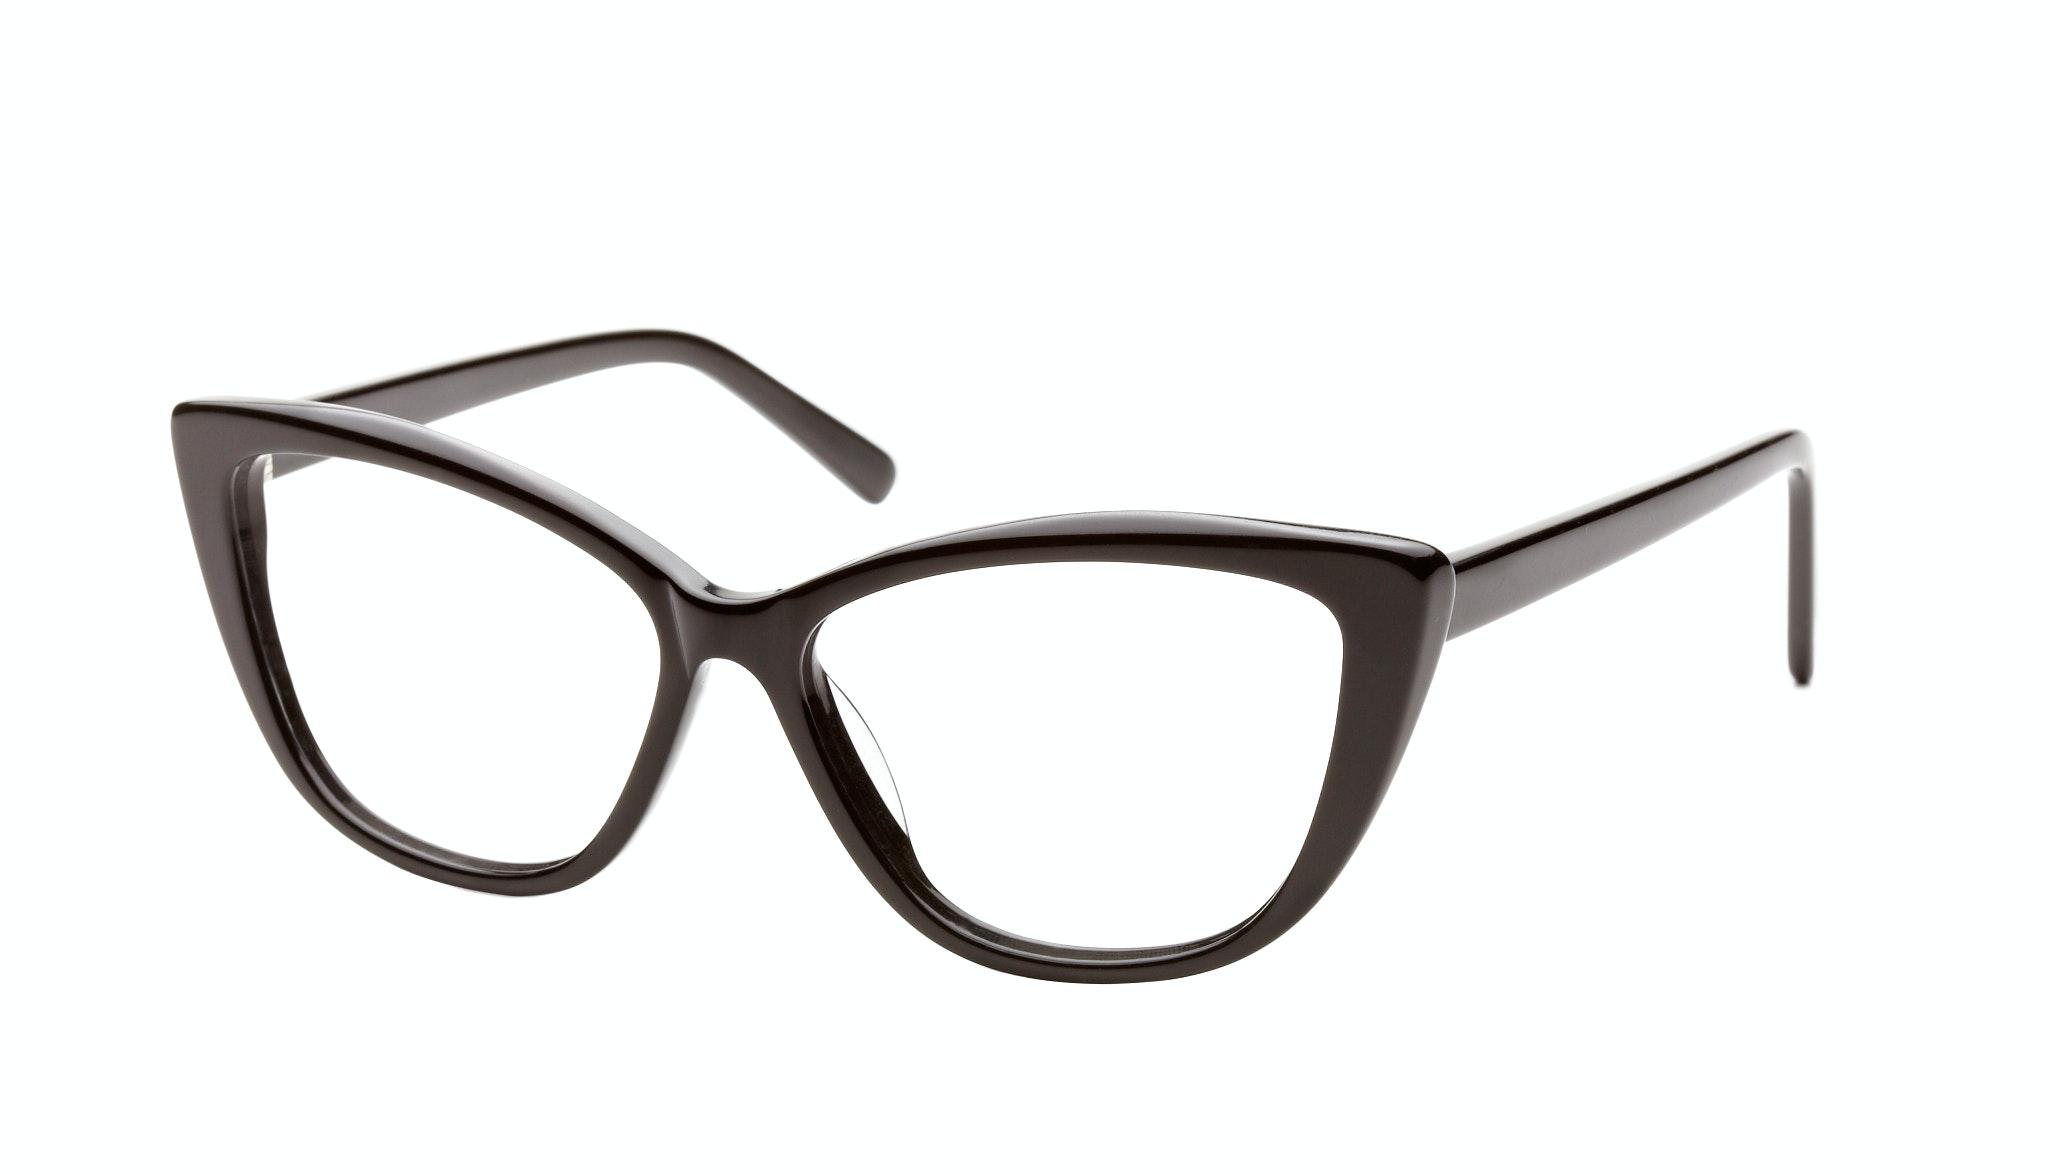 Affordable Fashion Glasses Cat Eye Eyeglasses Women Dolled Up Black Tilt